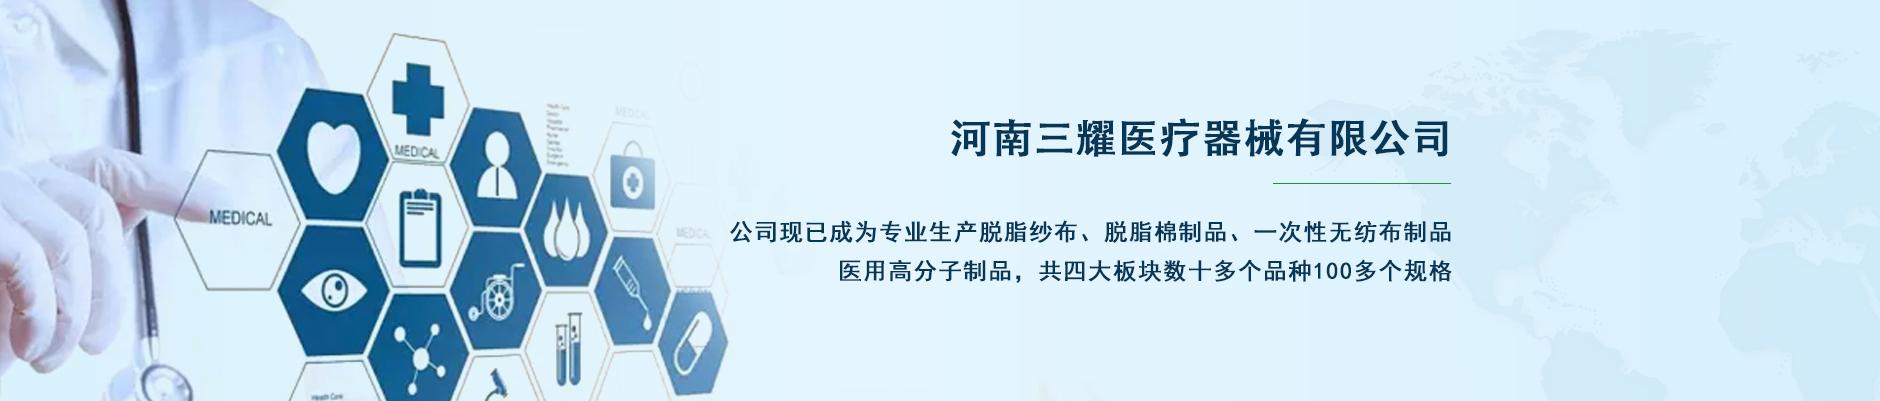 beplay官网网页纱布块